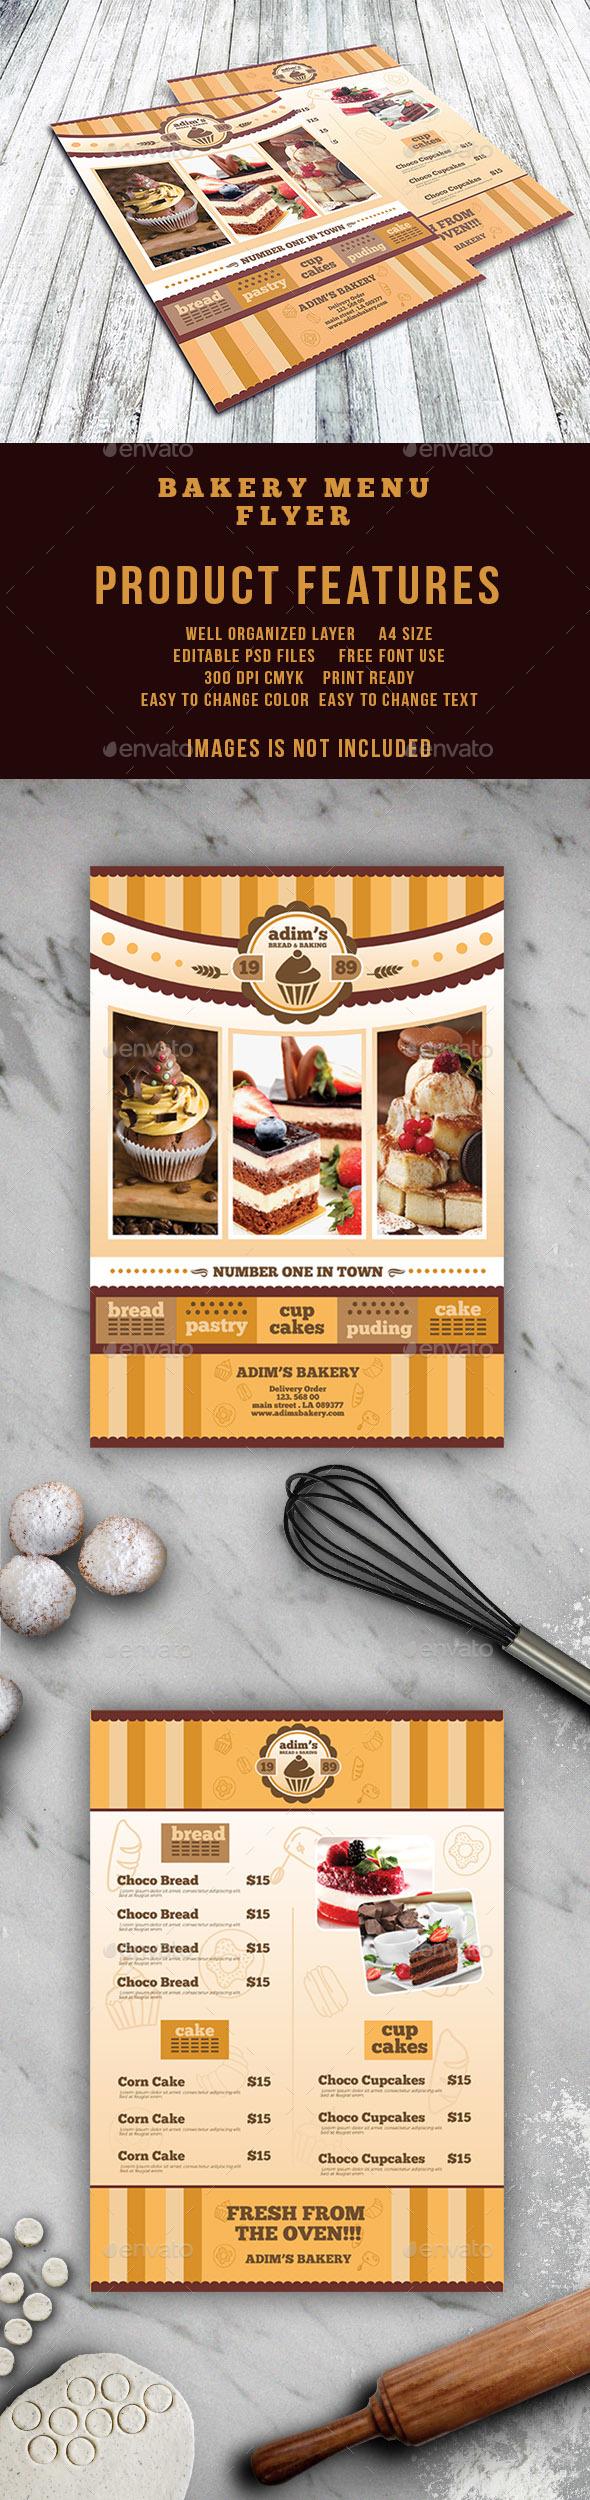 Bakery Menu Flyer Template